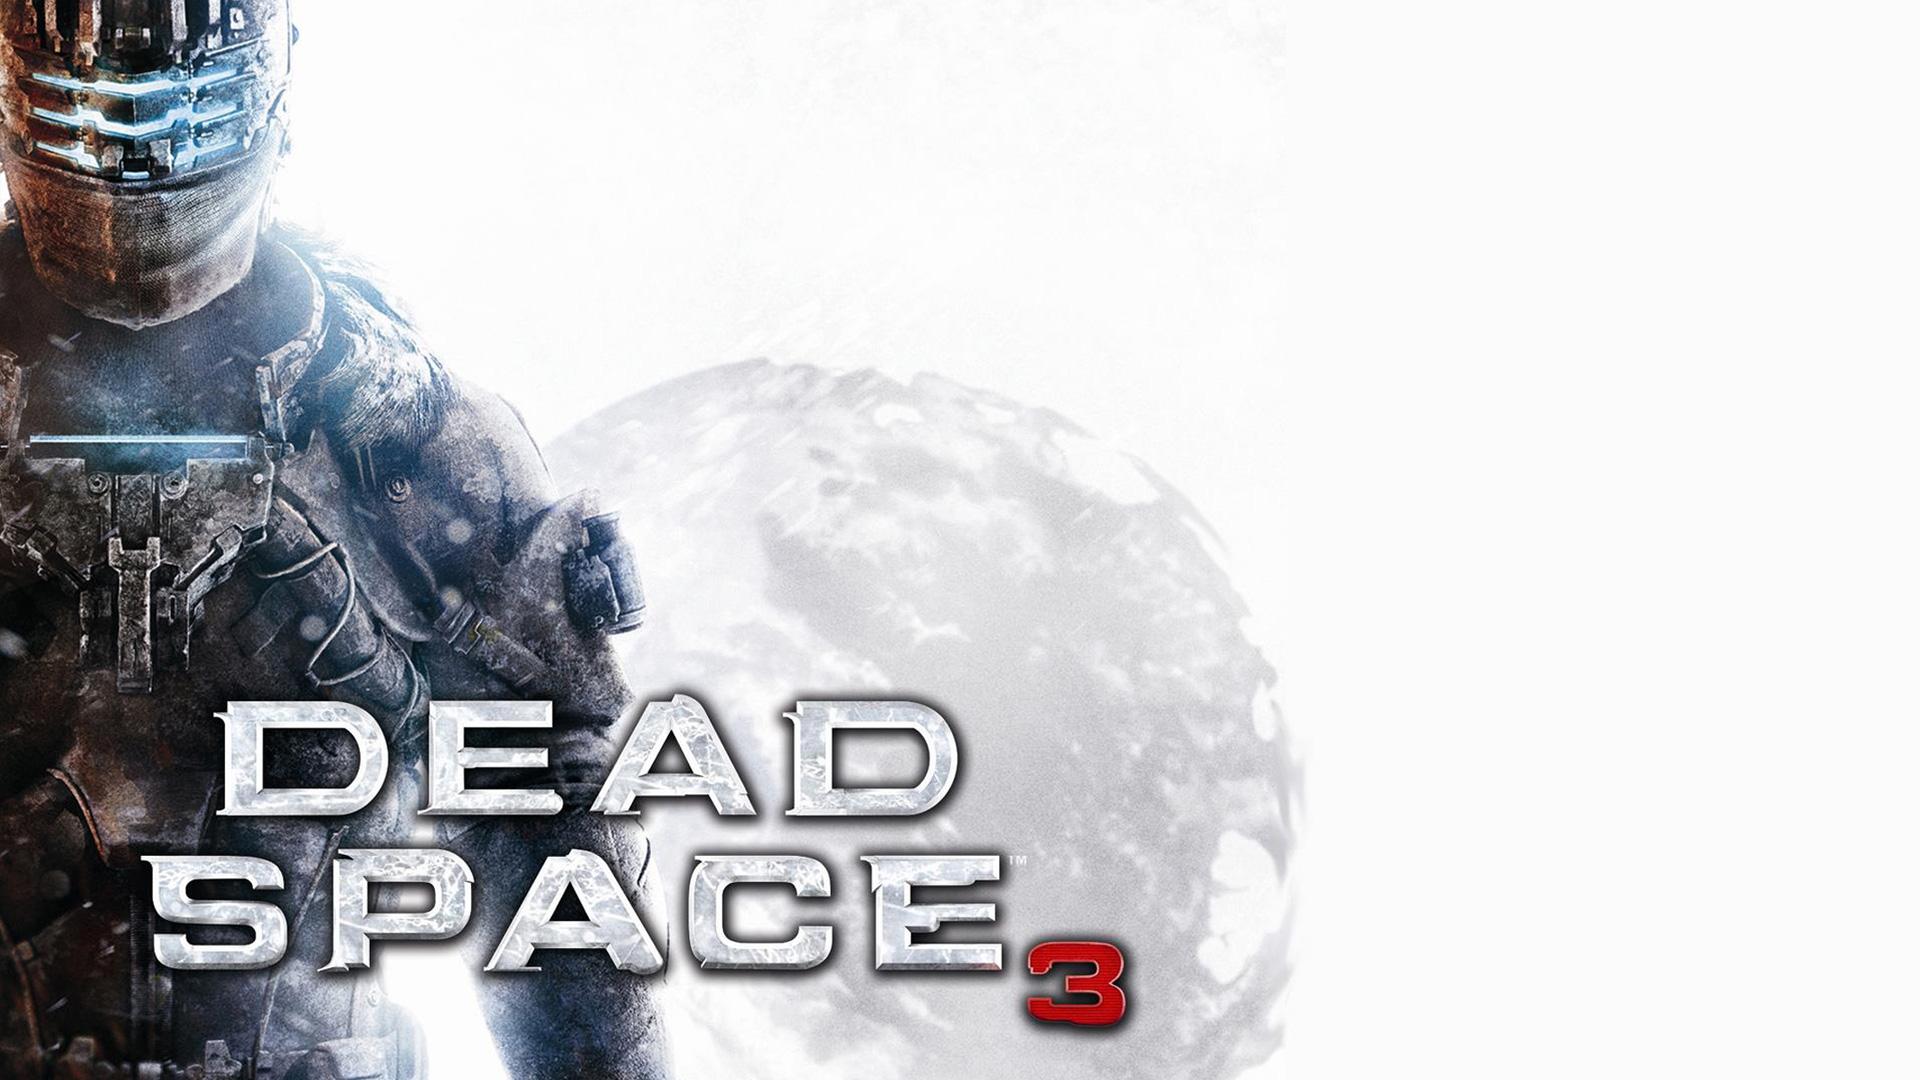 Dead Space 3 Wallpaper HD | Page 2